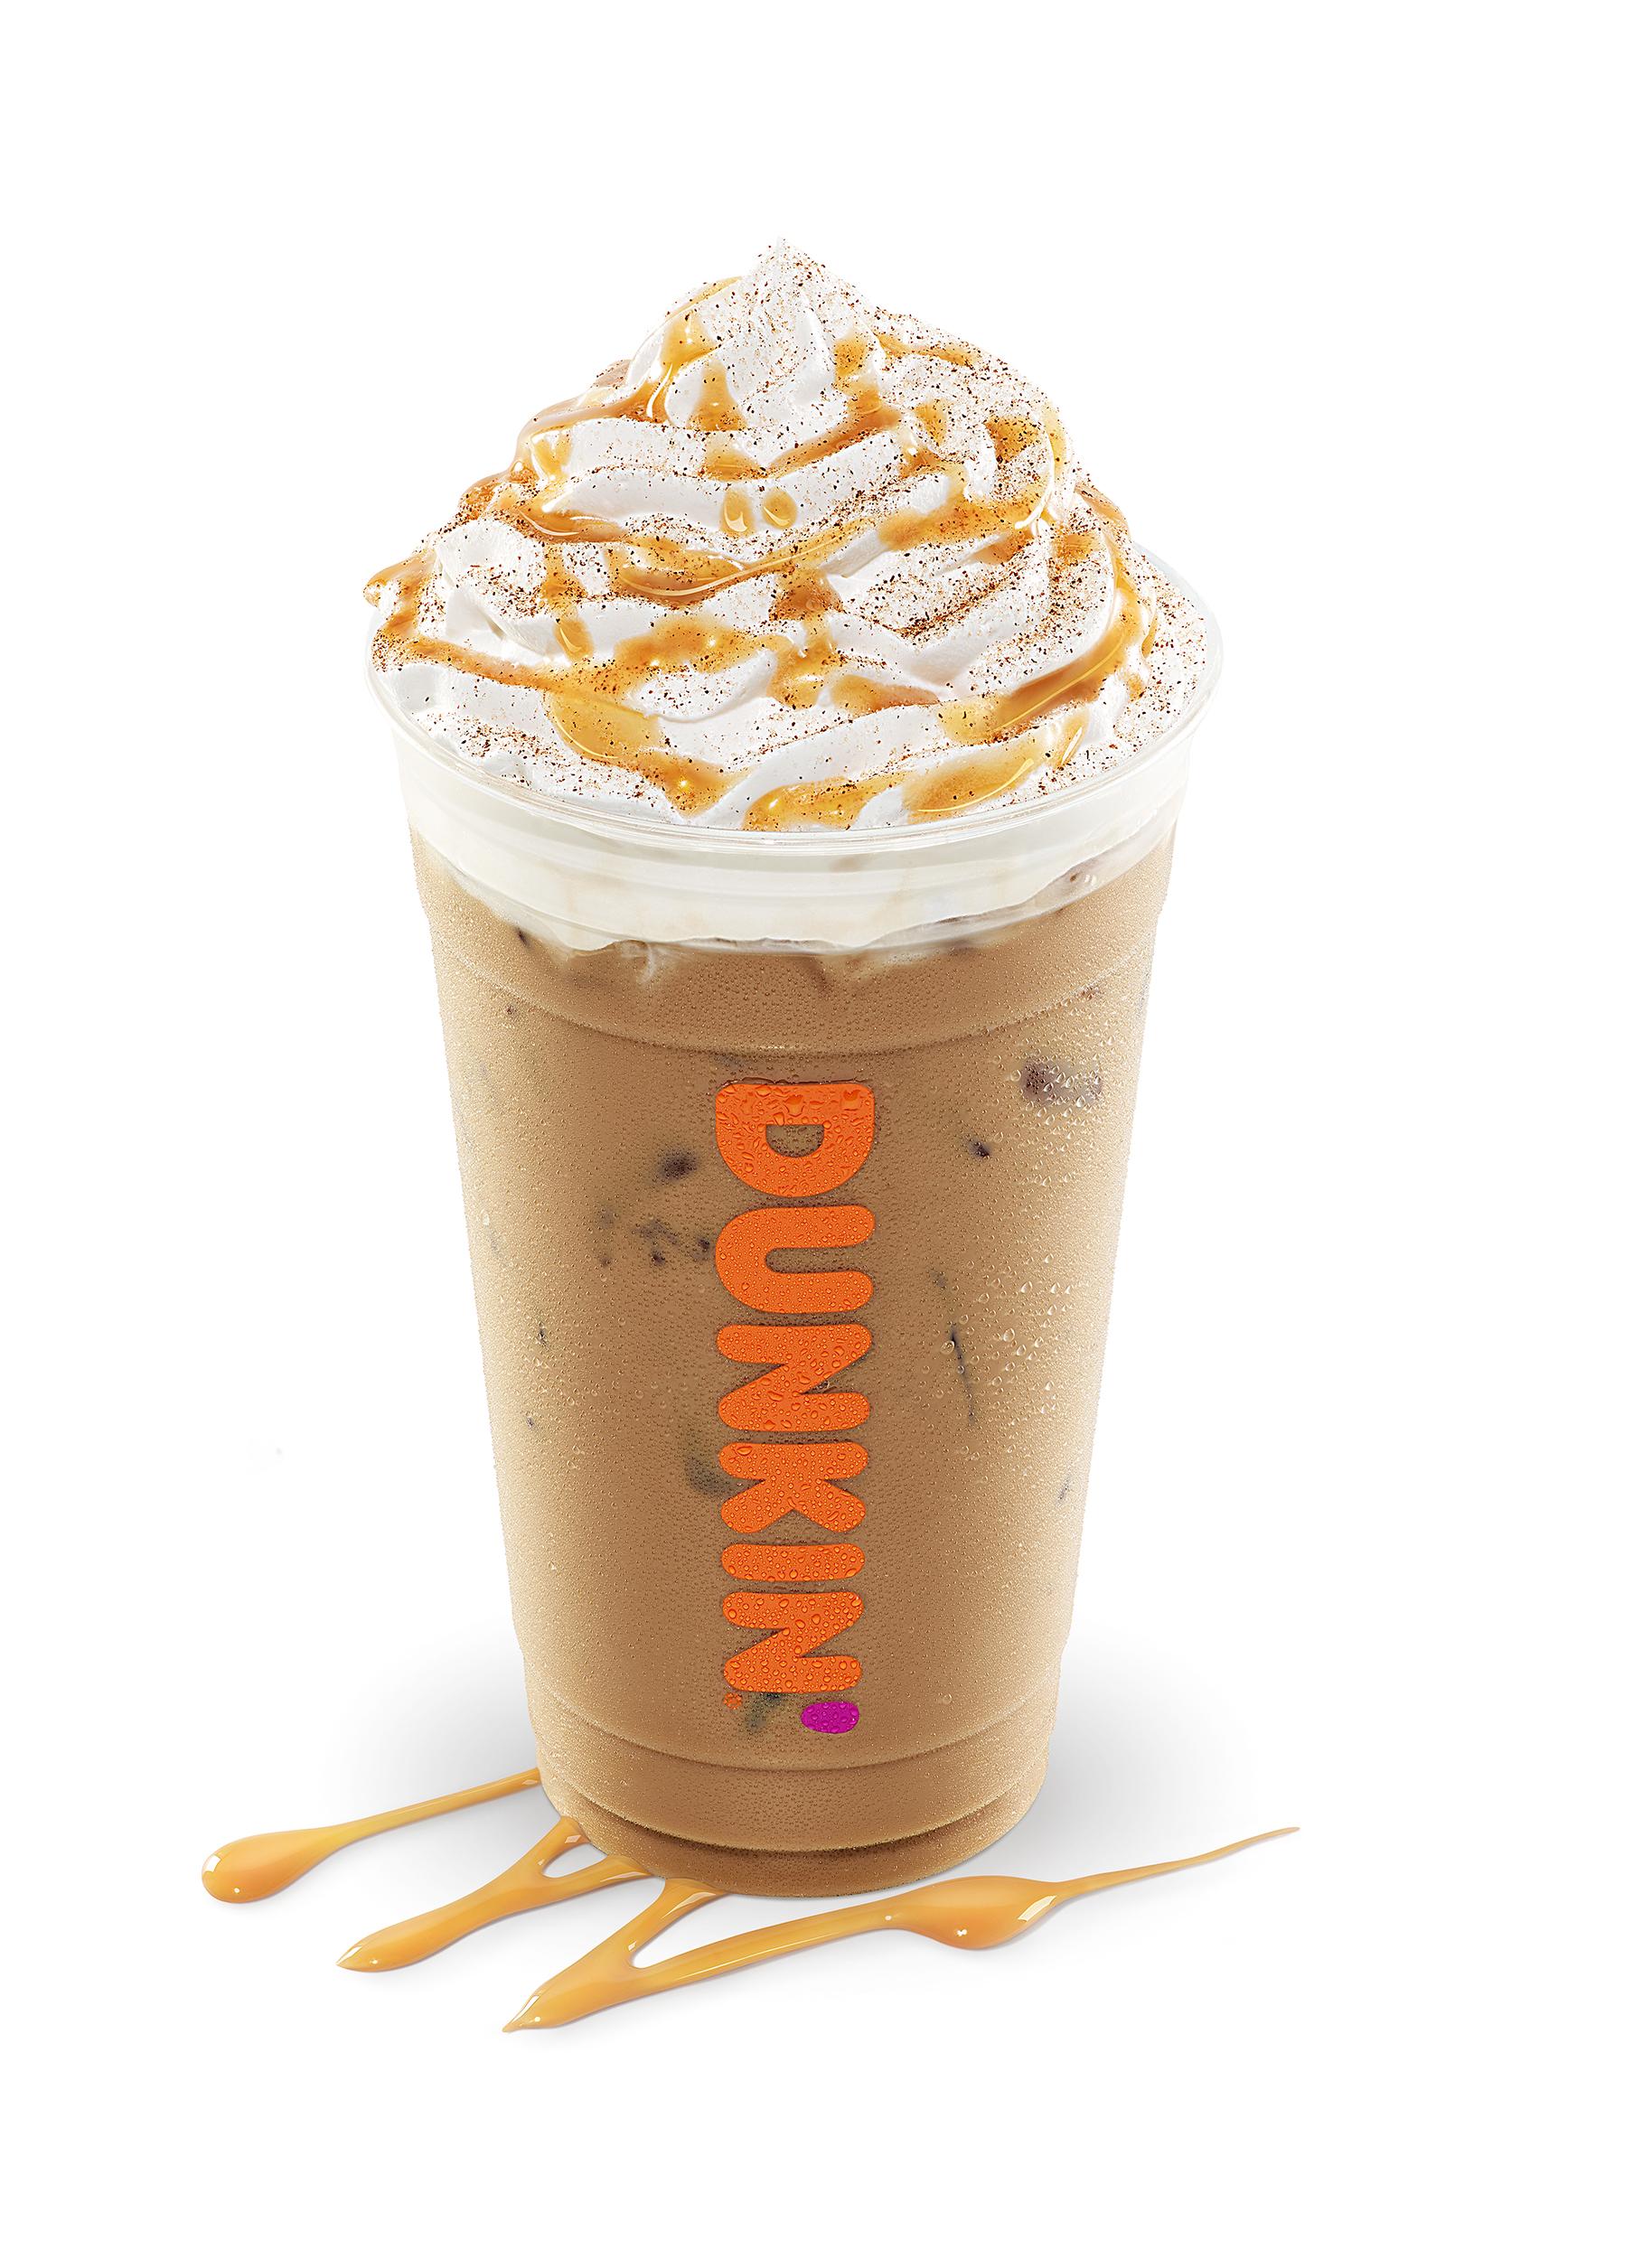 Dunkin Announces New Fall Menu With Pumpkin Spice Latte